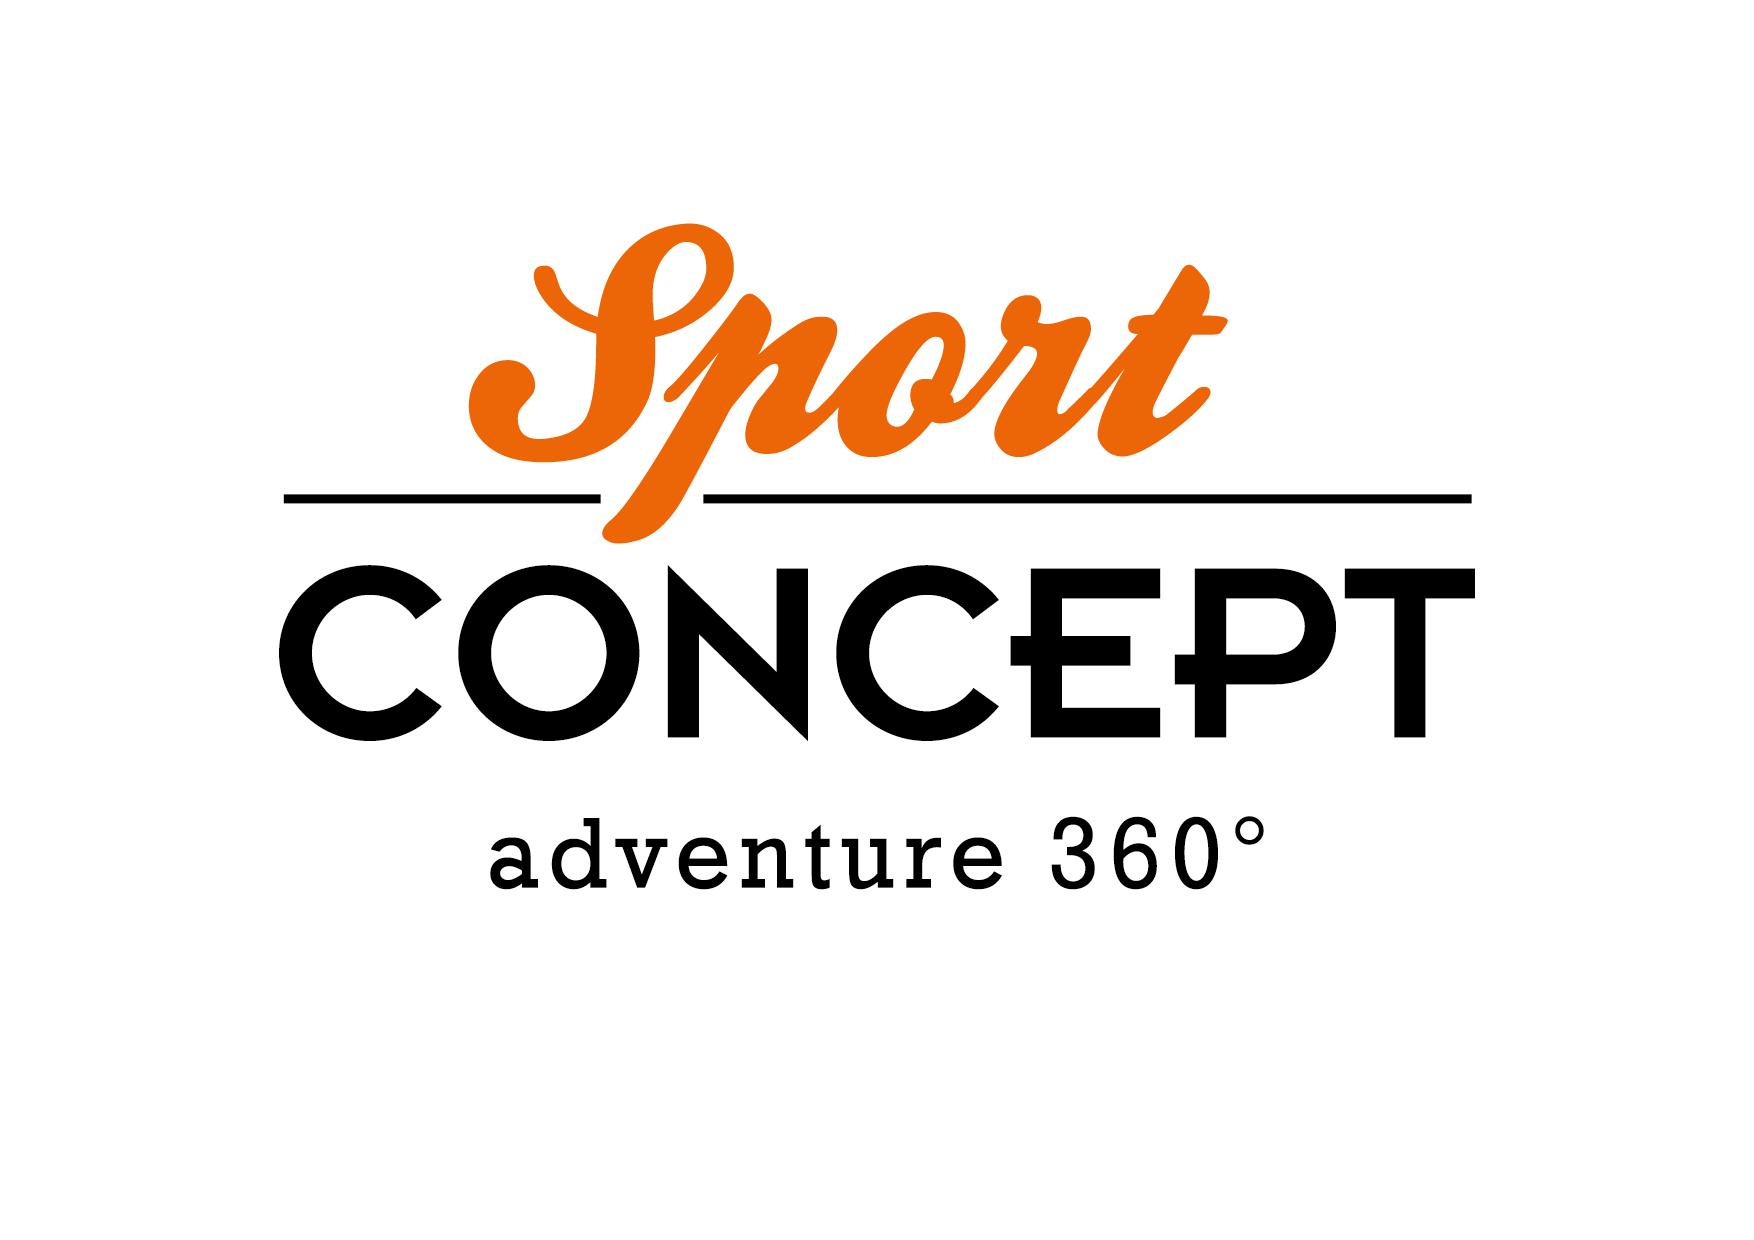 http://pfnw.eu/wp-content/uploads/2020/03/SPORTCONCEPT_logo_CMYK.png